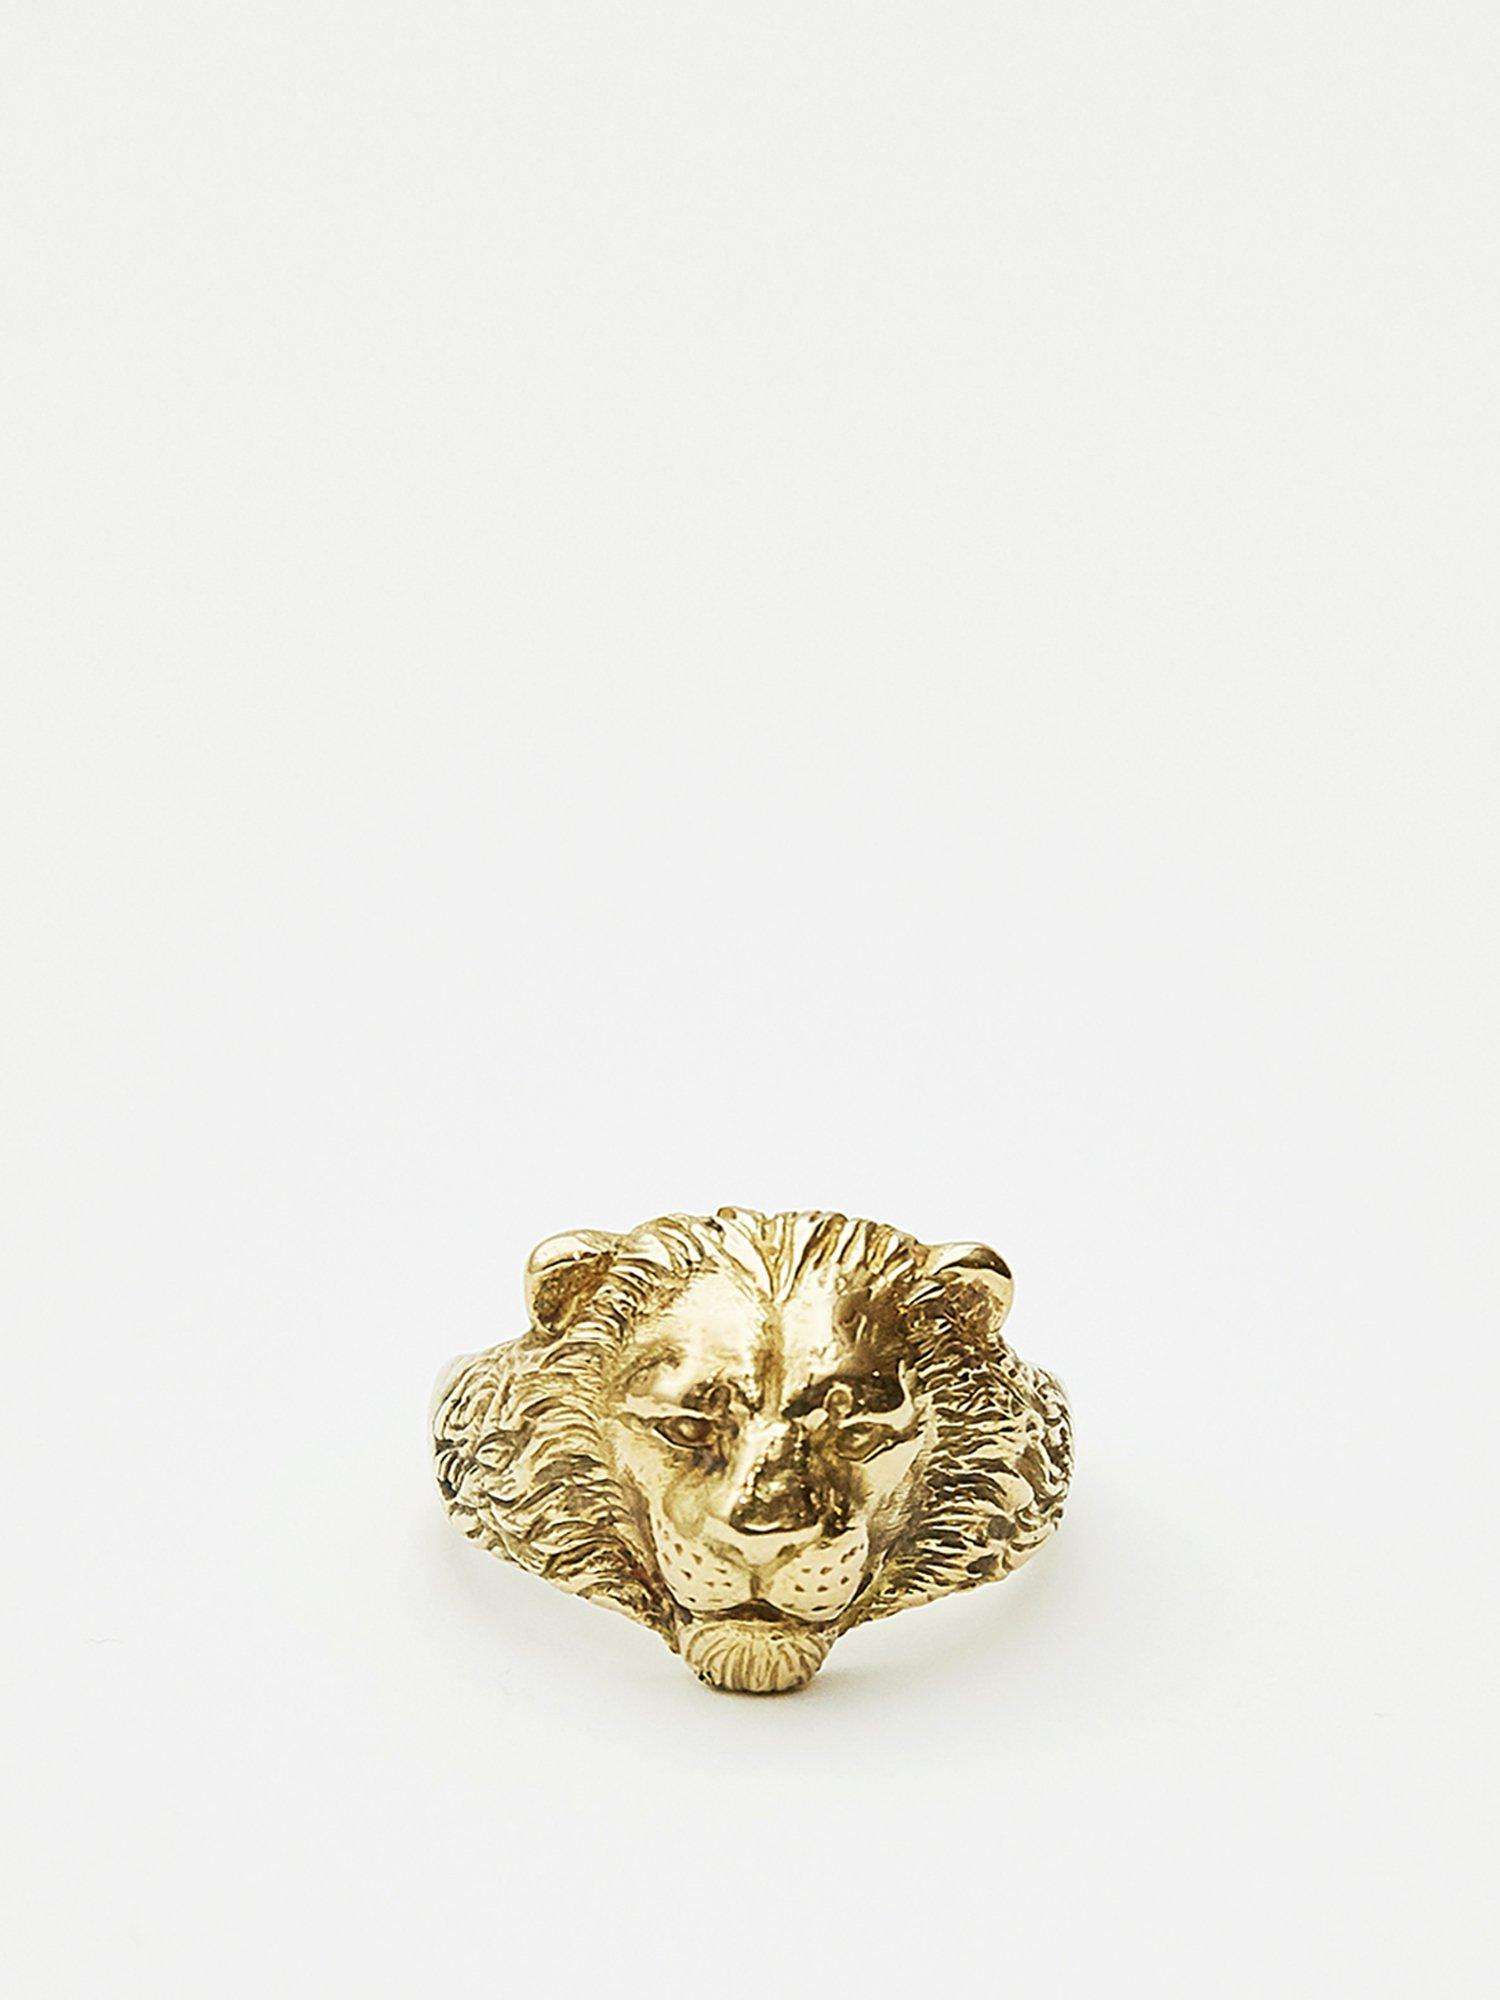 LOLO / Leo ring / 13号 / 在庫商品